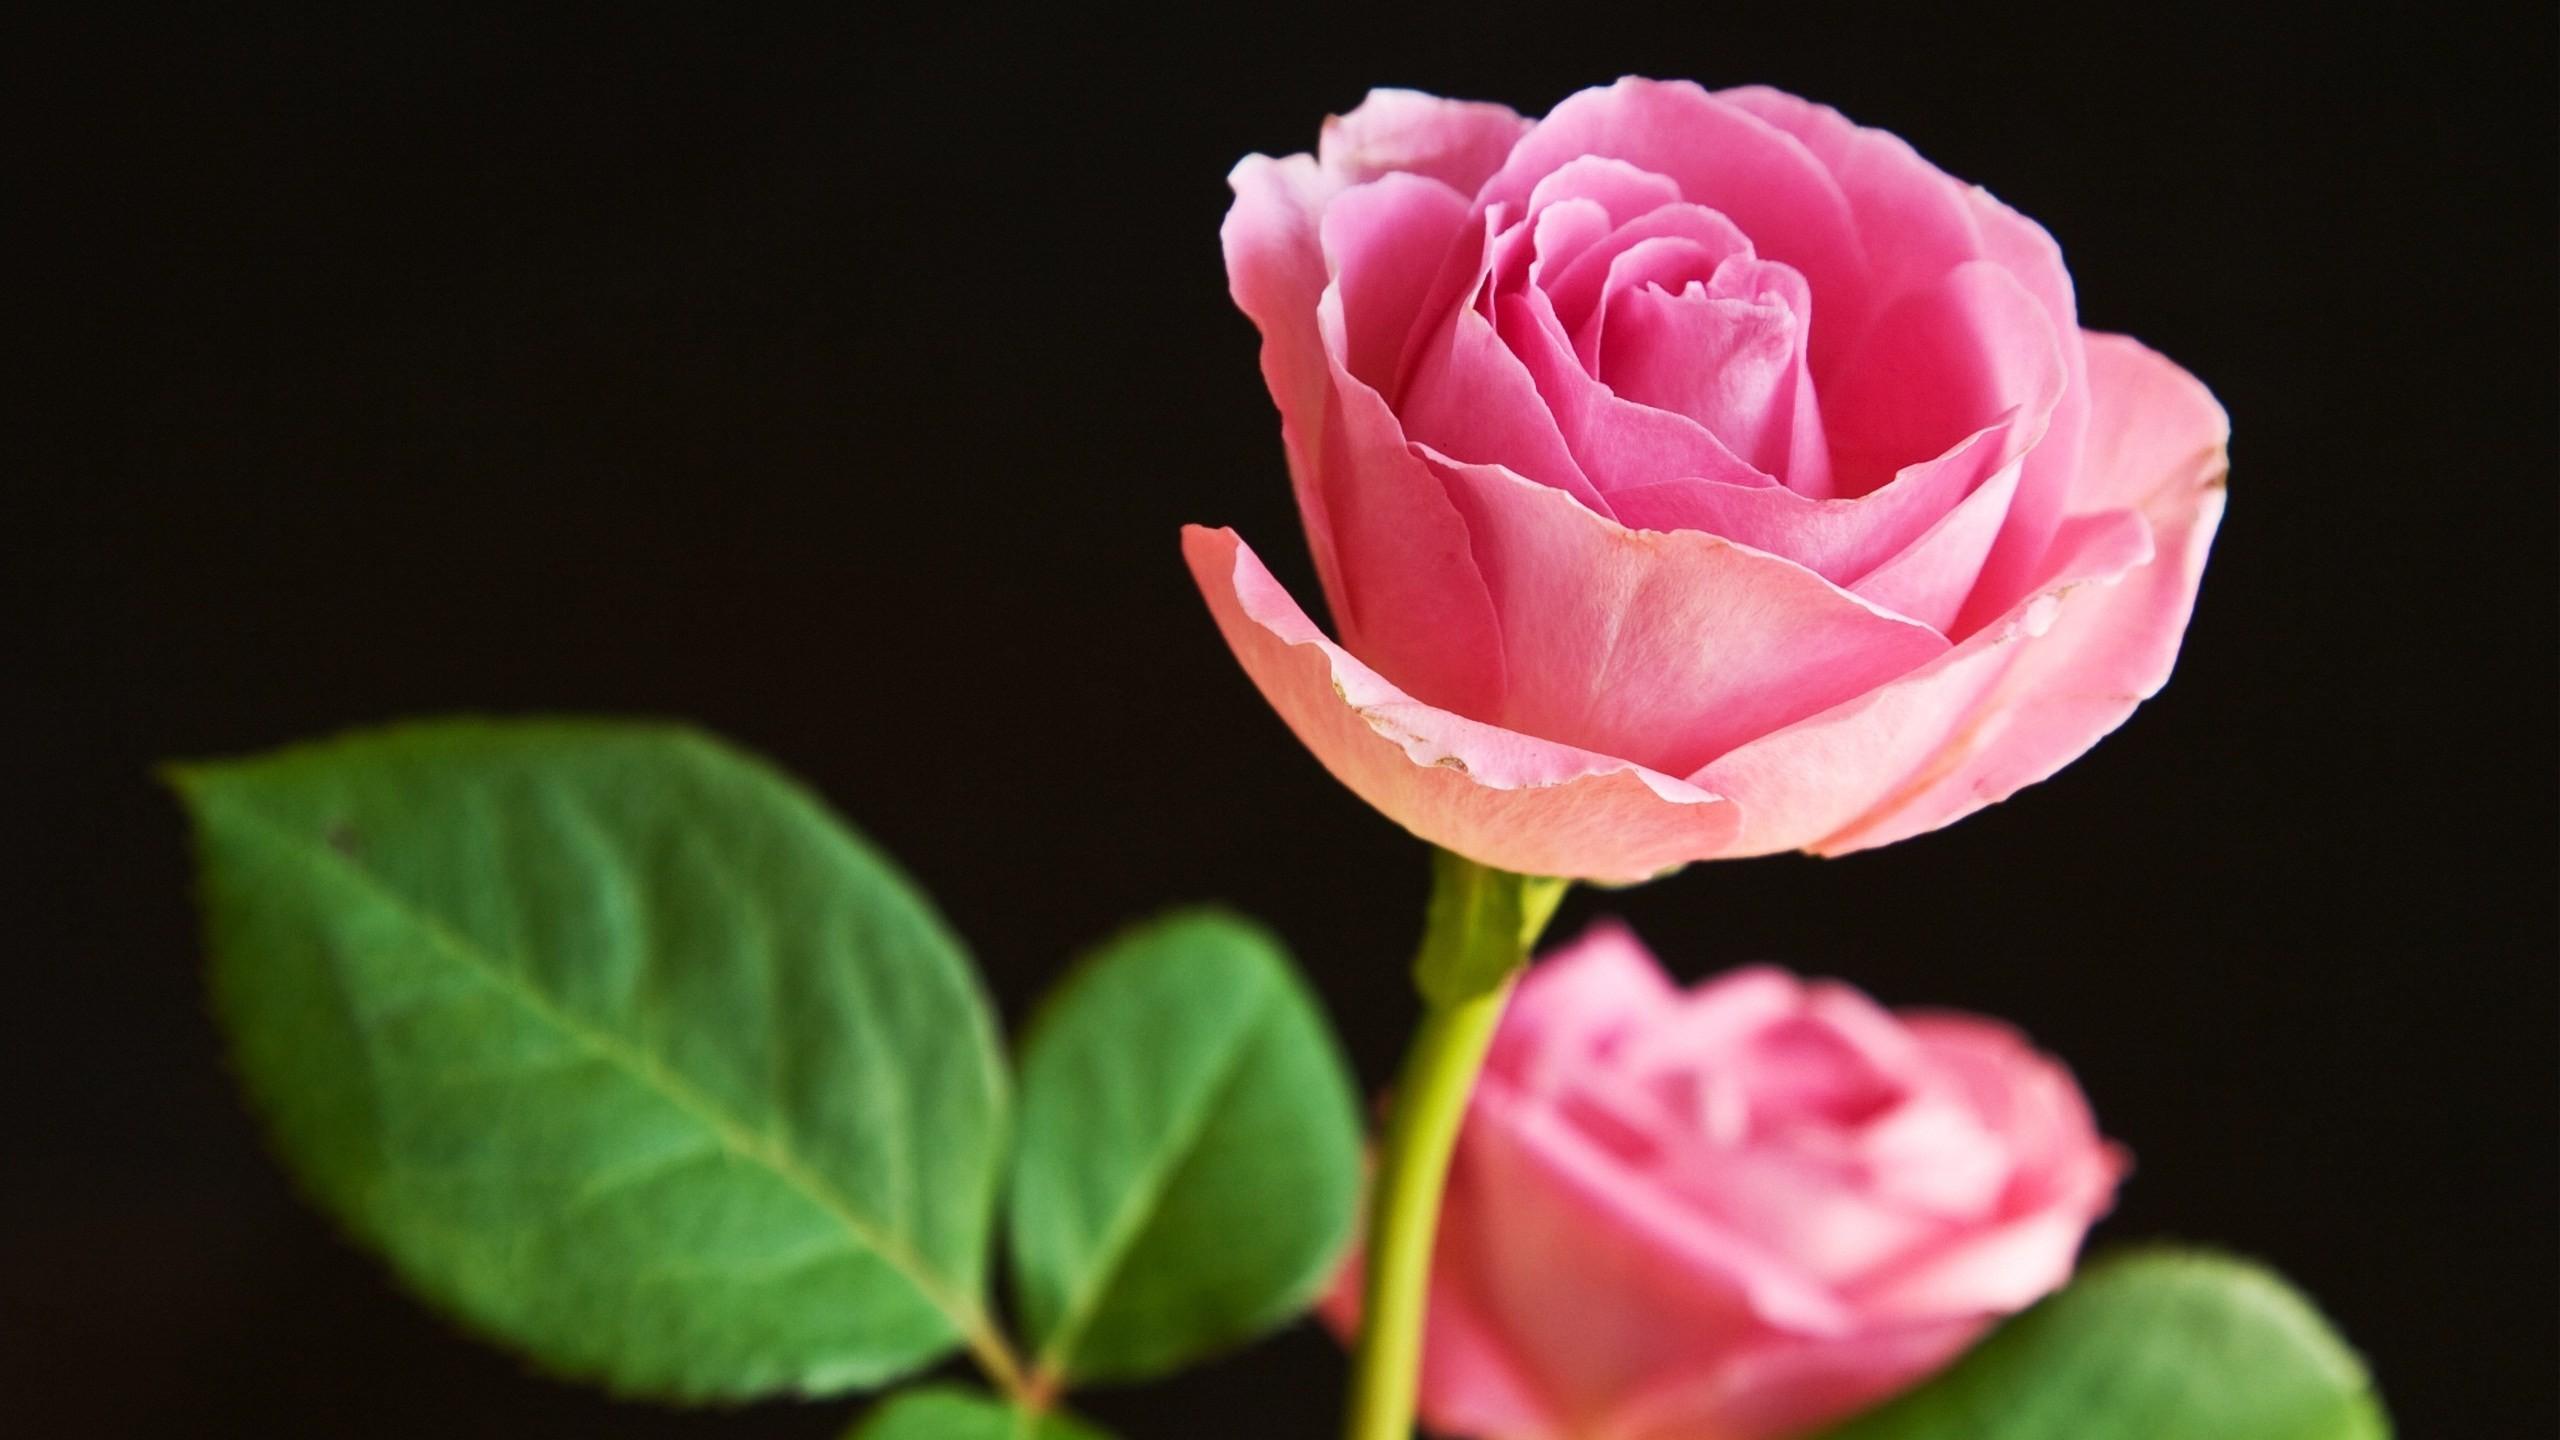 Rose flower wallpapers for desktop 48 images 2560x1440 beautiful flowers photos for desktop background izmirmasajfo